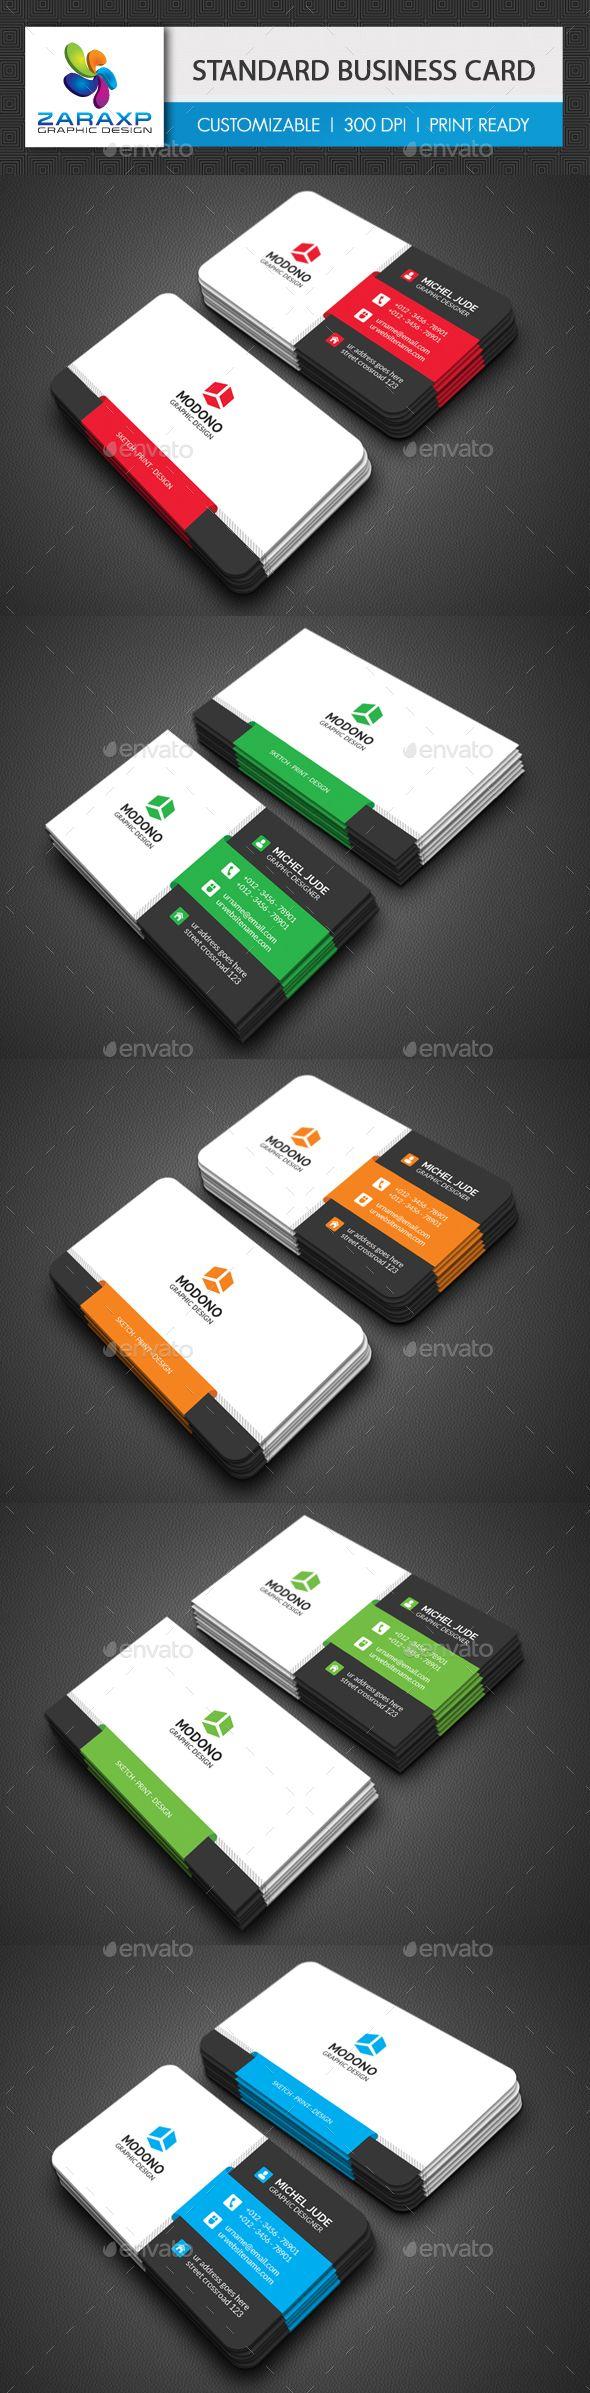 Standard Business Card Template PSD. Download here: http://graphicriver.net/item/standard-business-card/15220905?ref=ksioks